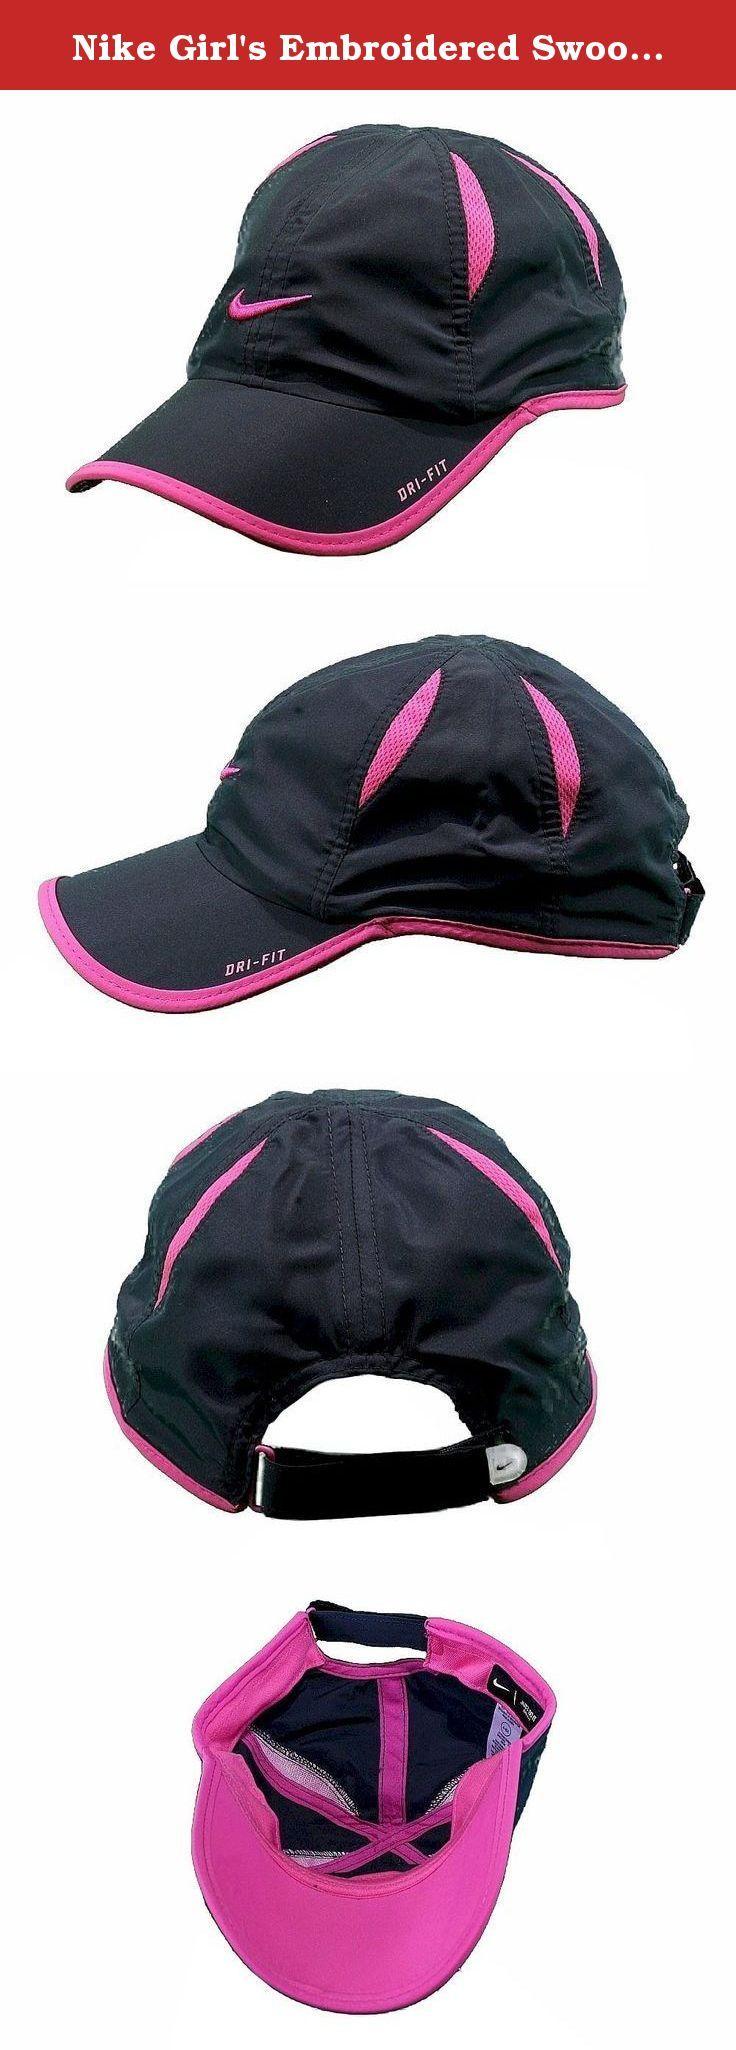 e0cfaf2422d Nike Girl s Embroidered Swoosh Logo Dri-Fit Baseball Cap SZ 4 6X  (Anthracite). Nike DRI-FIT Hat.